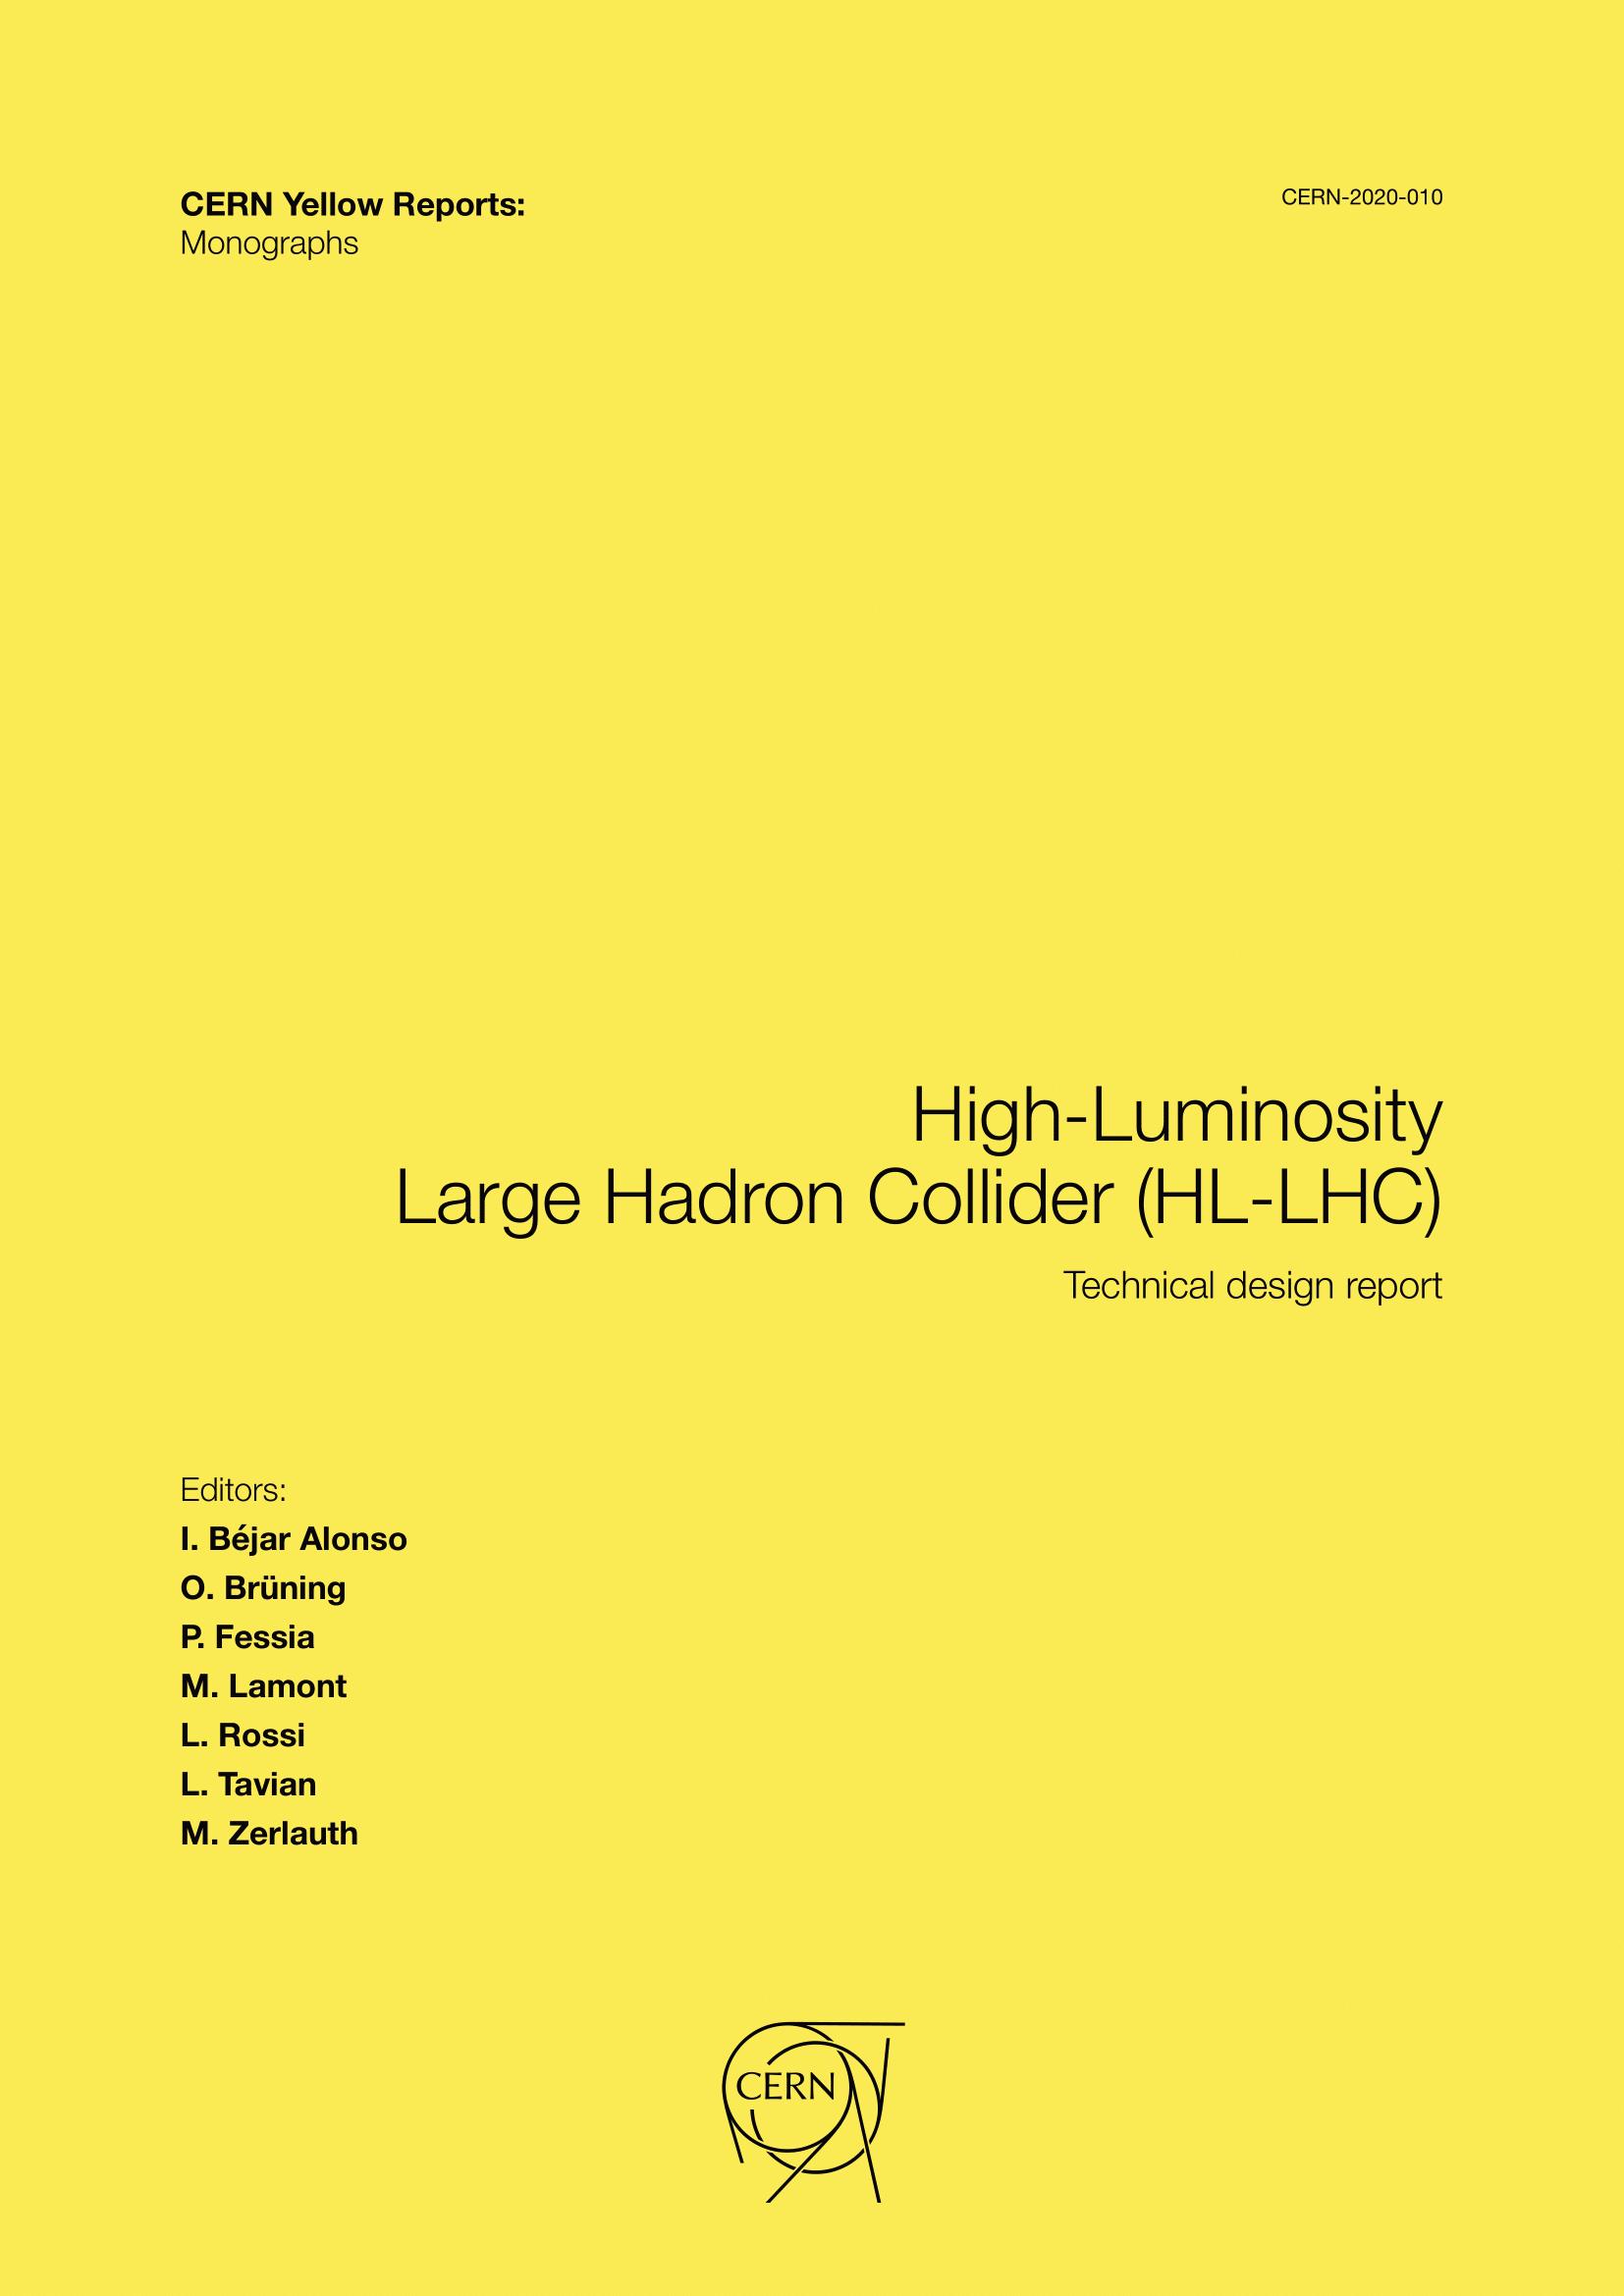 View Vol. 10 (2020): High-Luminosity Large Hadron Collider (HL-LHC): Technical design report